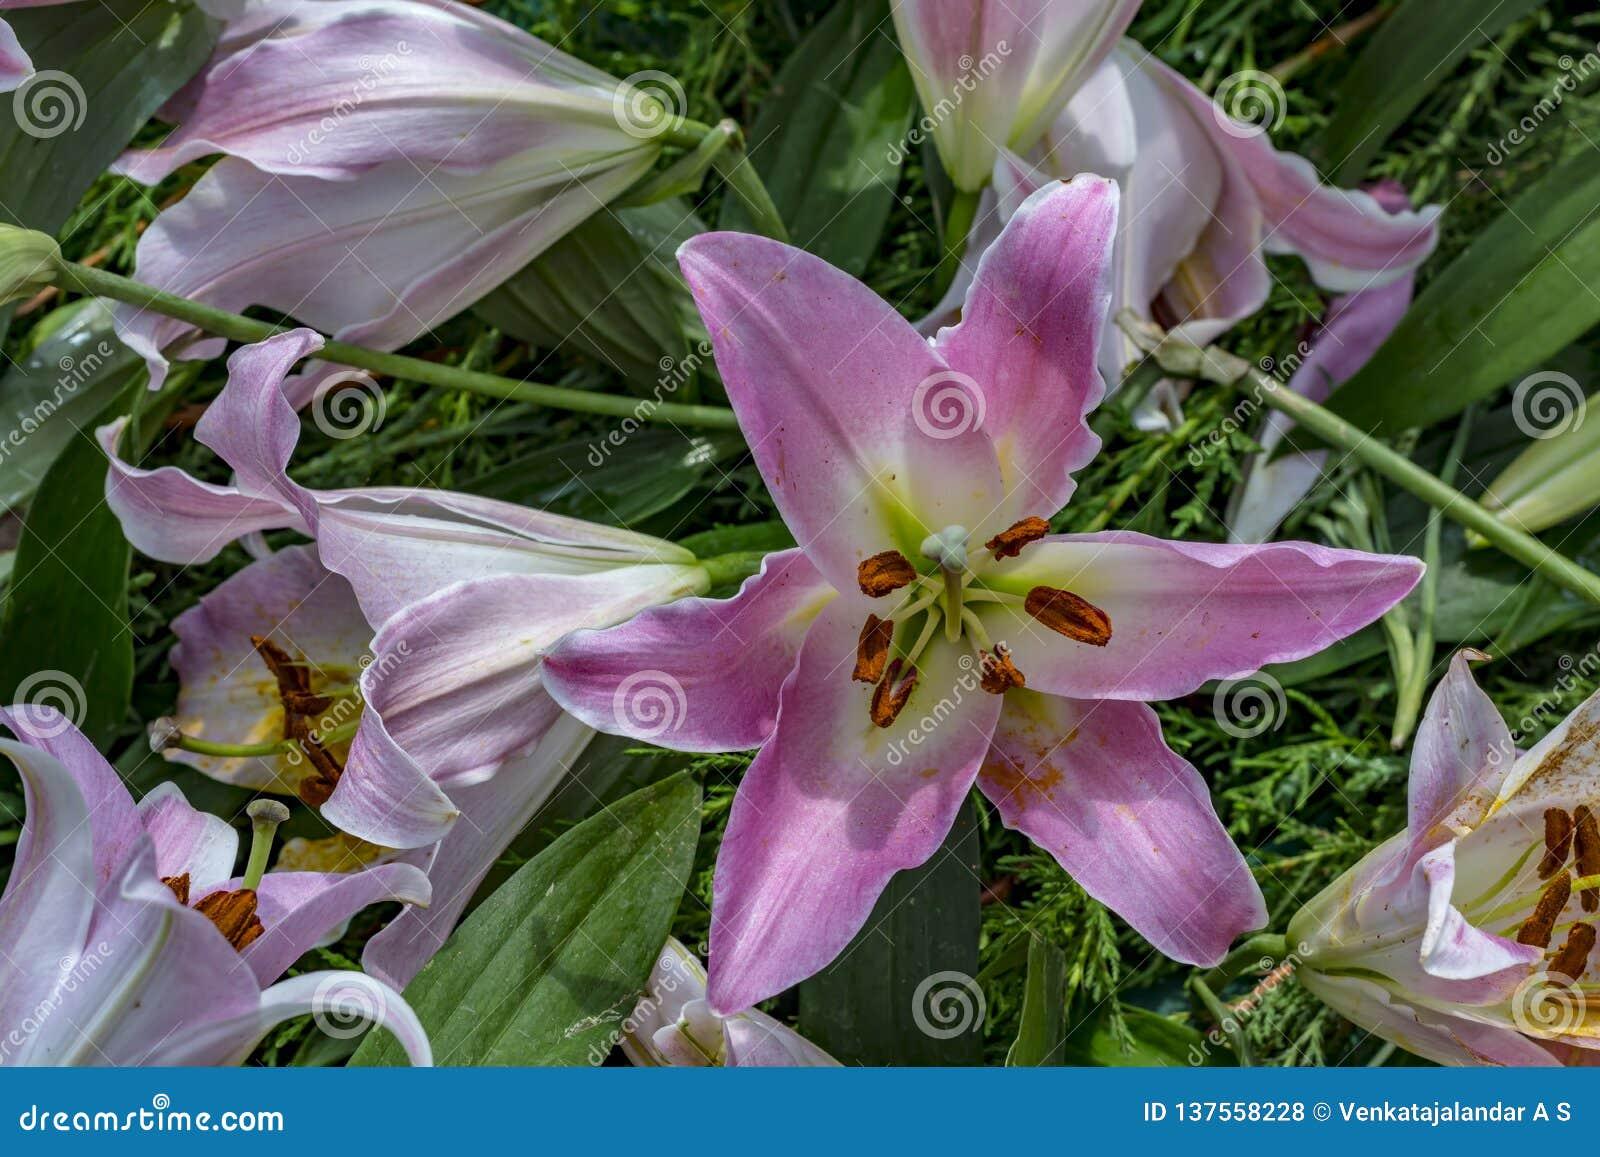 Bunch of Pink Stargazer Lily